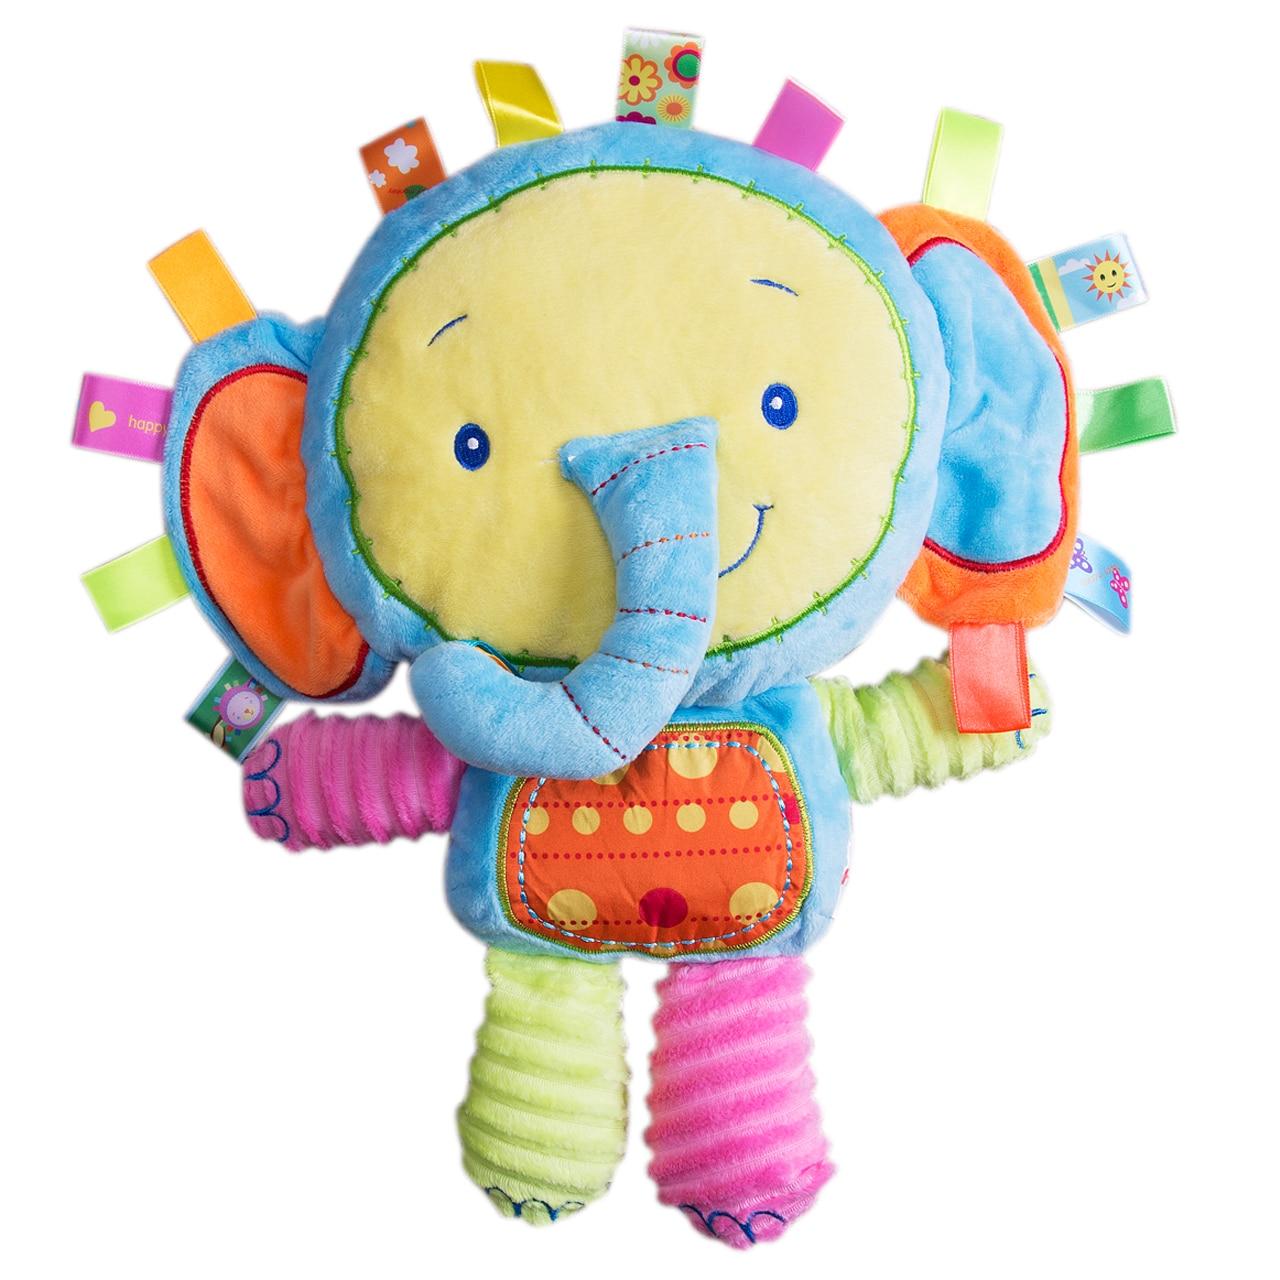 Cute Animal Handbells Developmental lovely Toy Bed Bells Kids Baby Soft Plush Popular Toys Rattle Hot